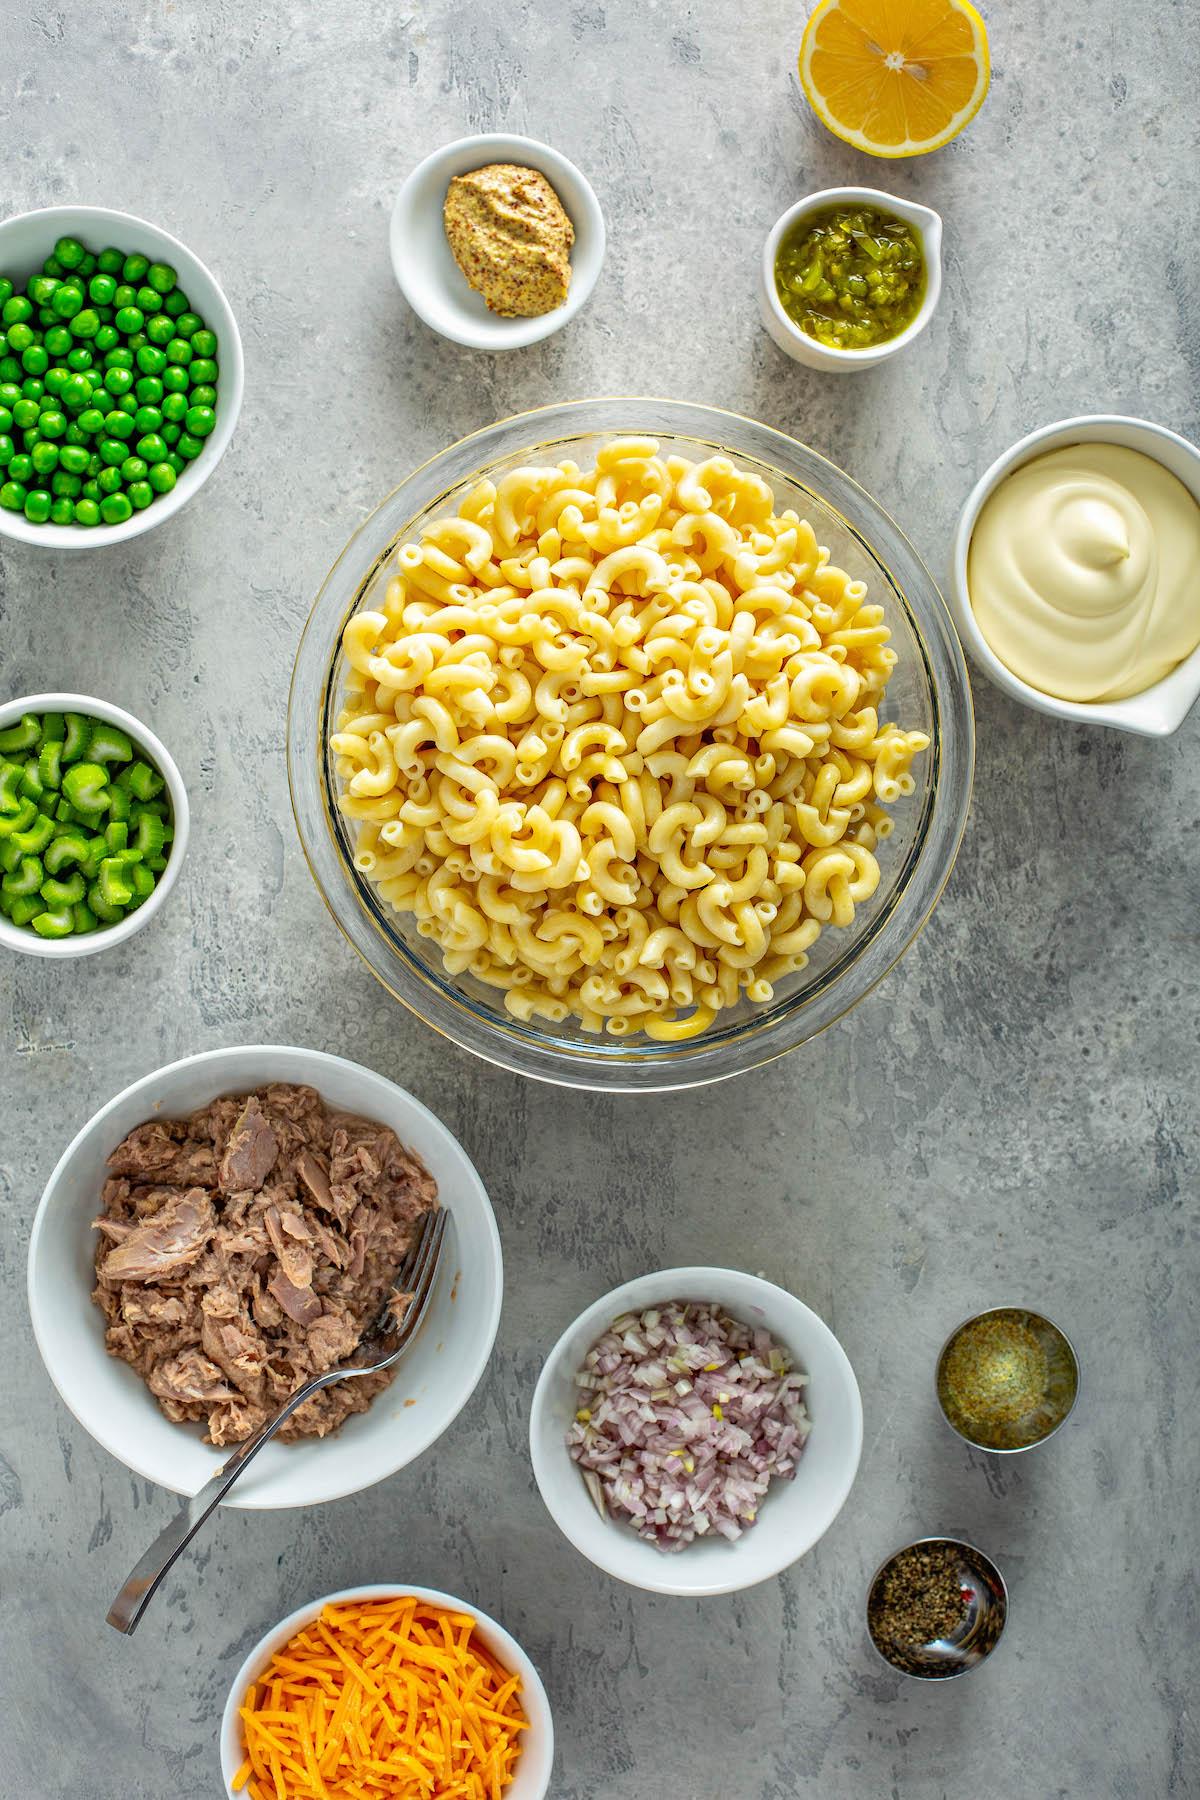 Ingredients for tuna macaroni salad.